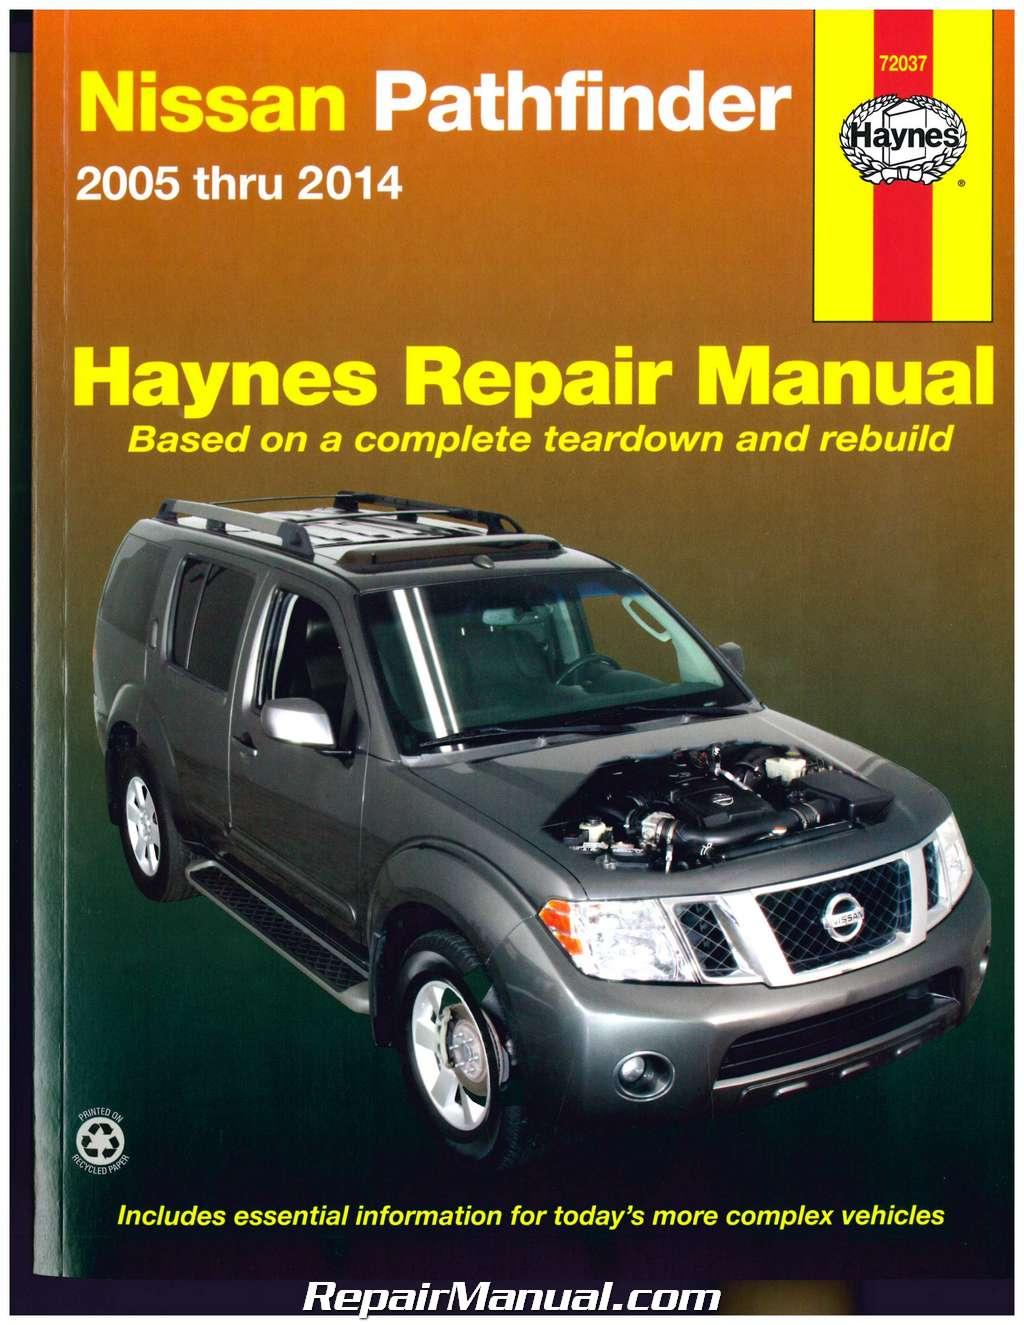 nissan pathfinder 2005 2014 haynes suv repair manual rh repairmanual com